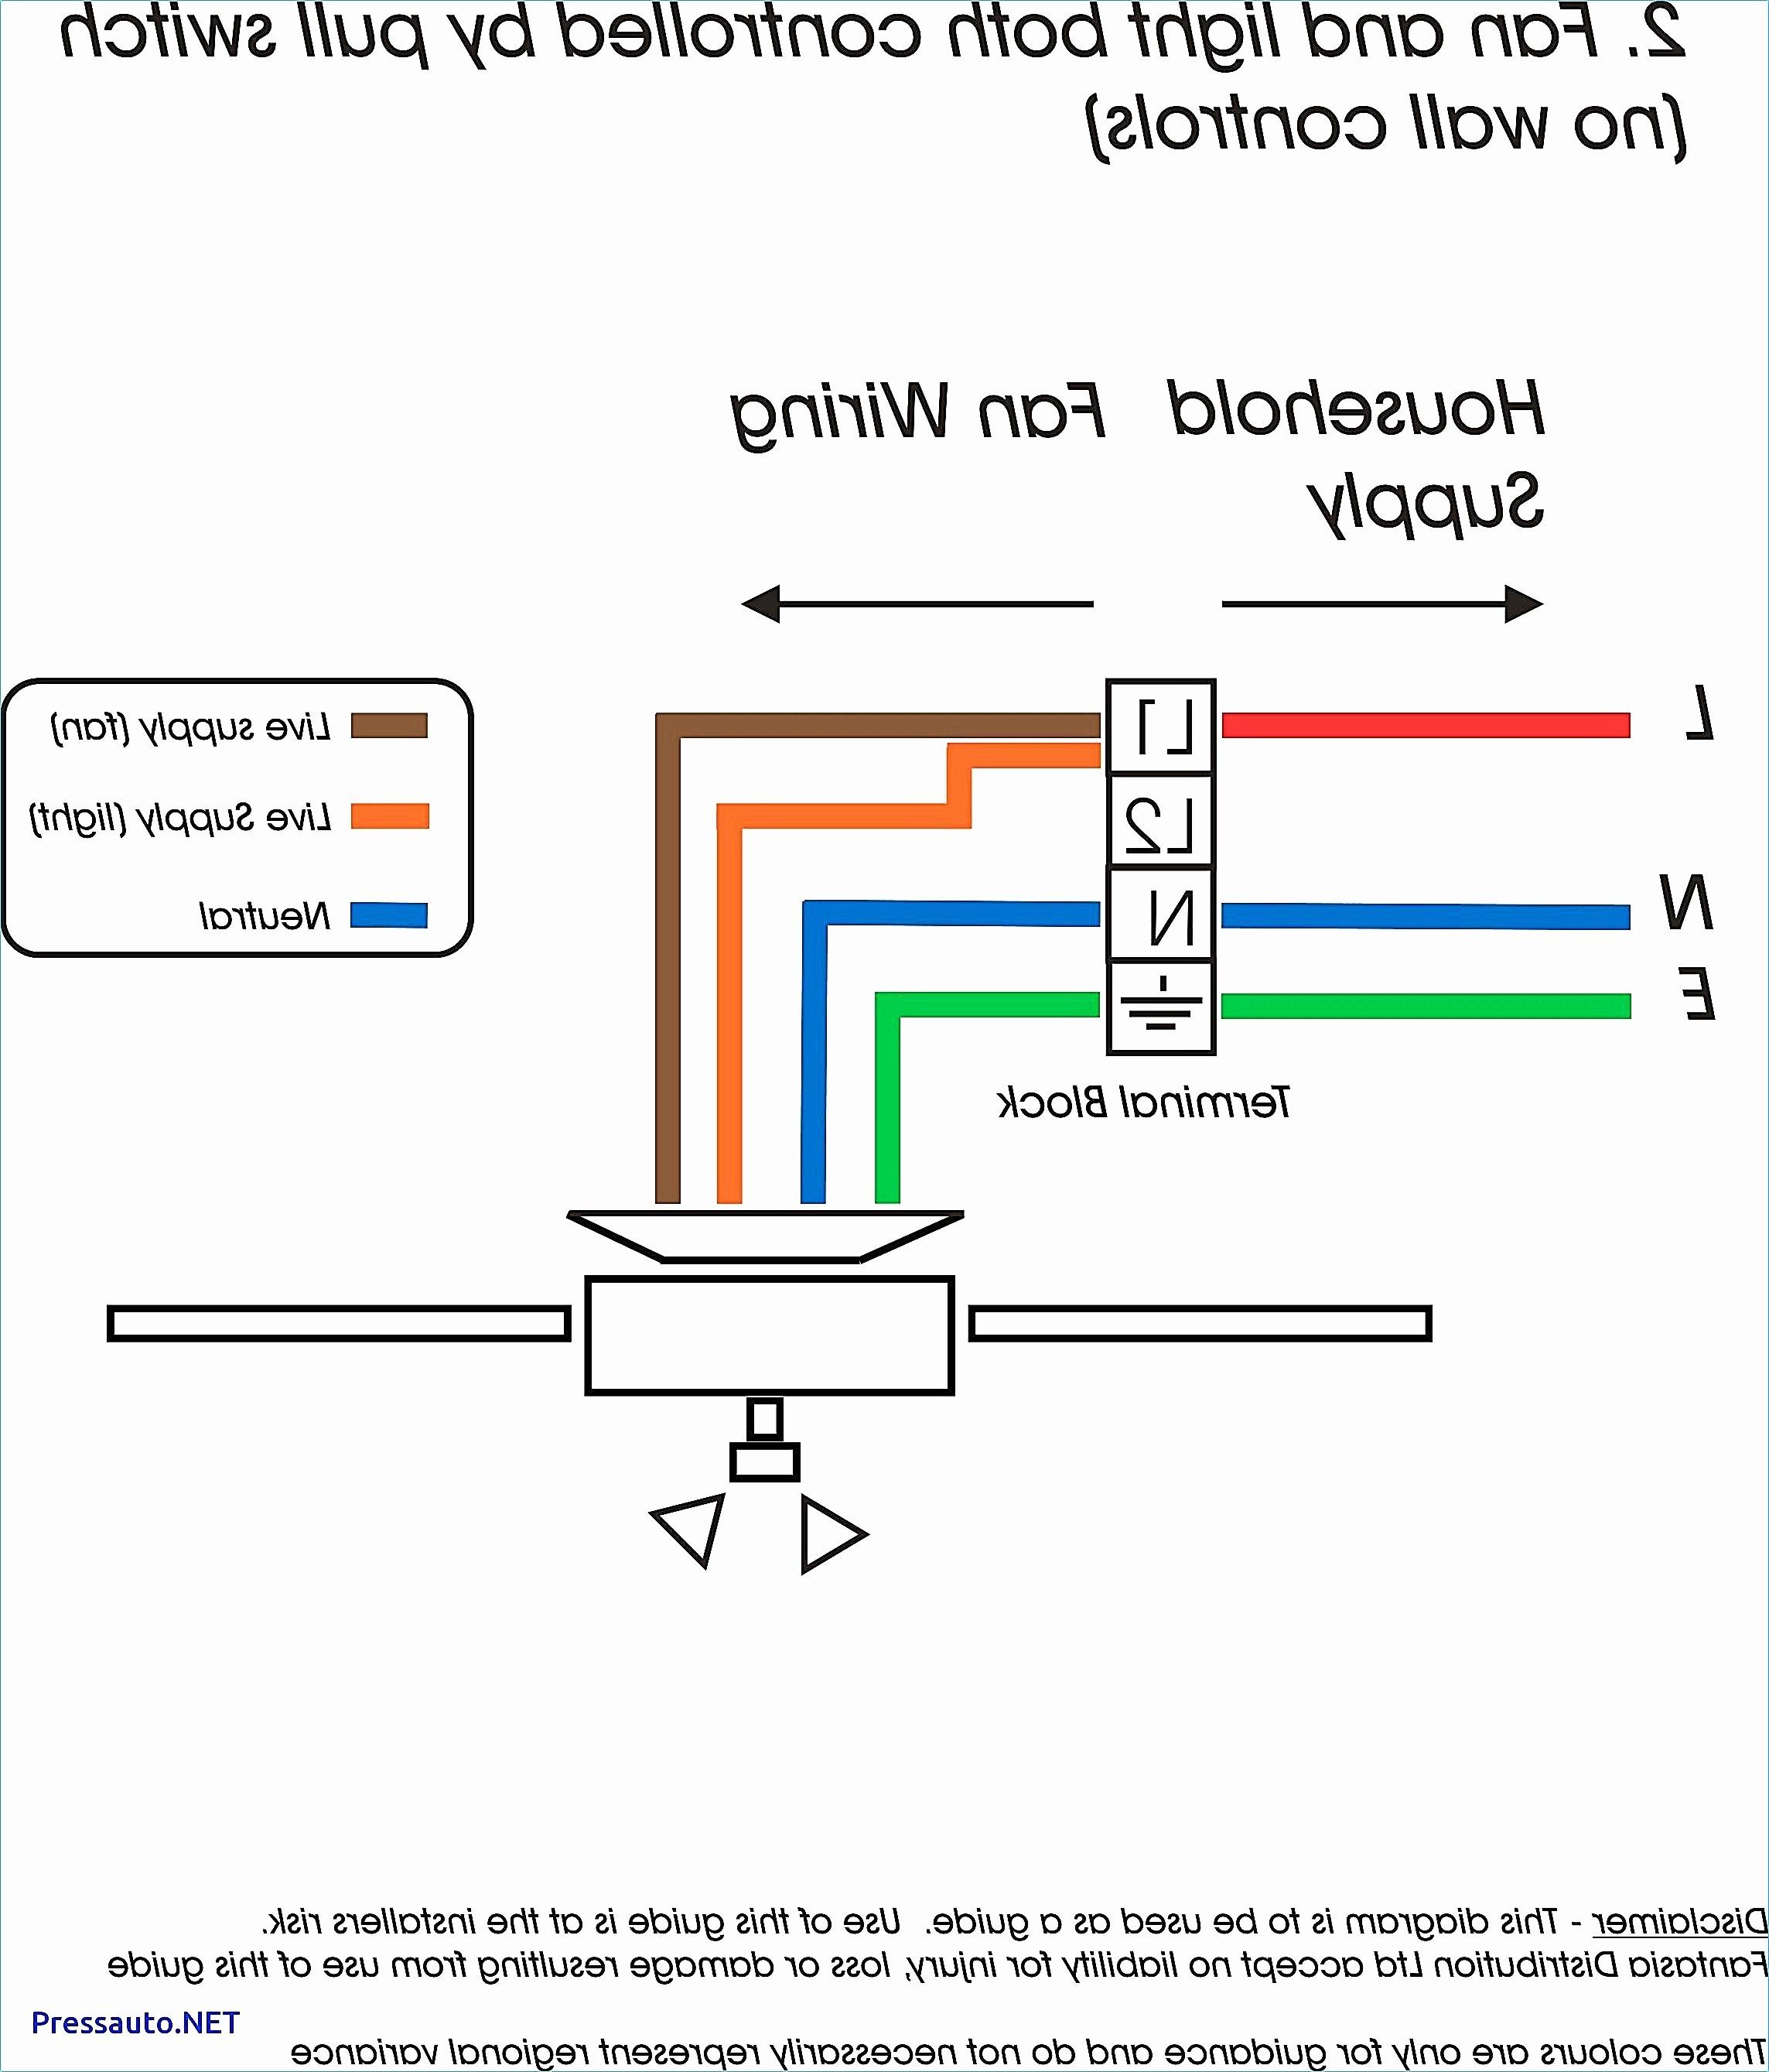 furnas contactor wiring diagram Collection-Furnas Contactor Wiring Diagram New Add A Phase Wiring Diagram Sample 15-b